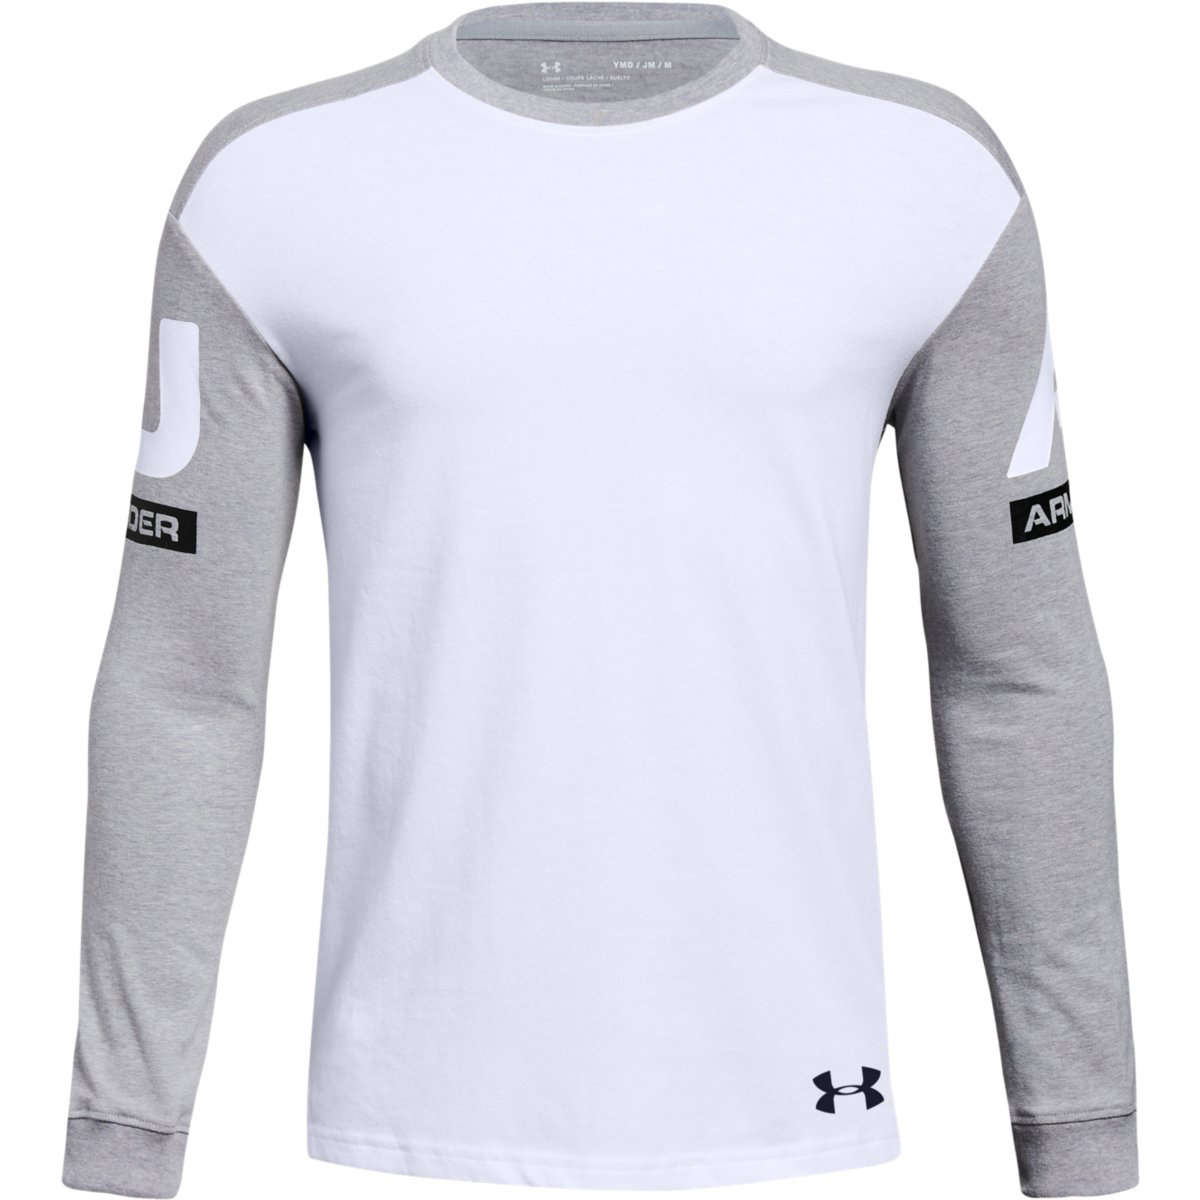 Under Armour Big Boys' Ua Sportstyle Crew Long-Sleeve Shirt - White, L